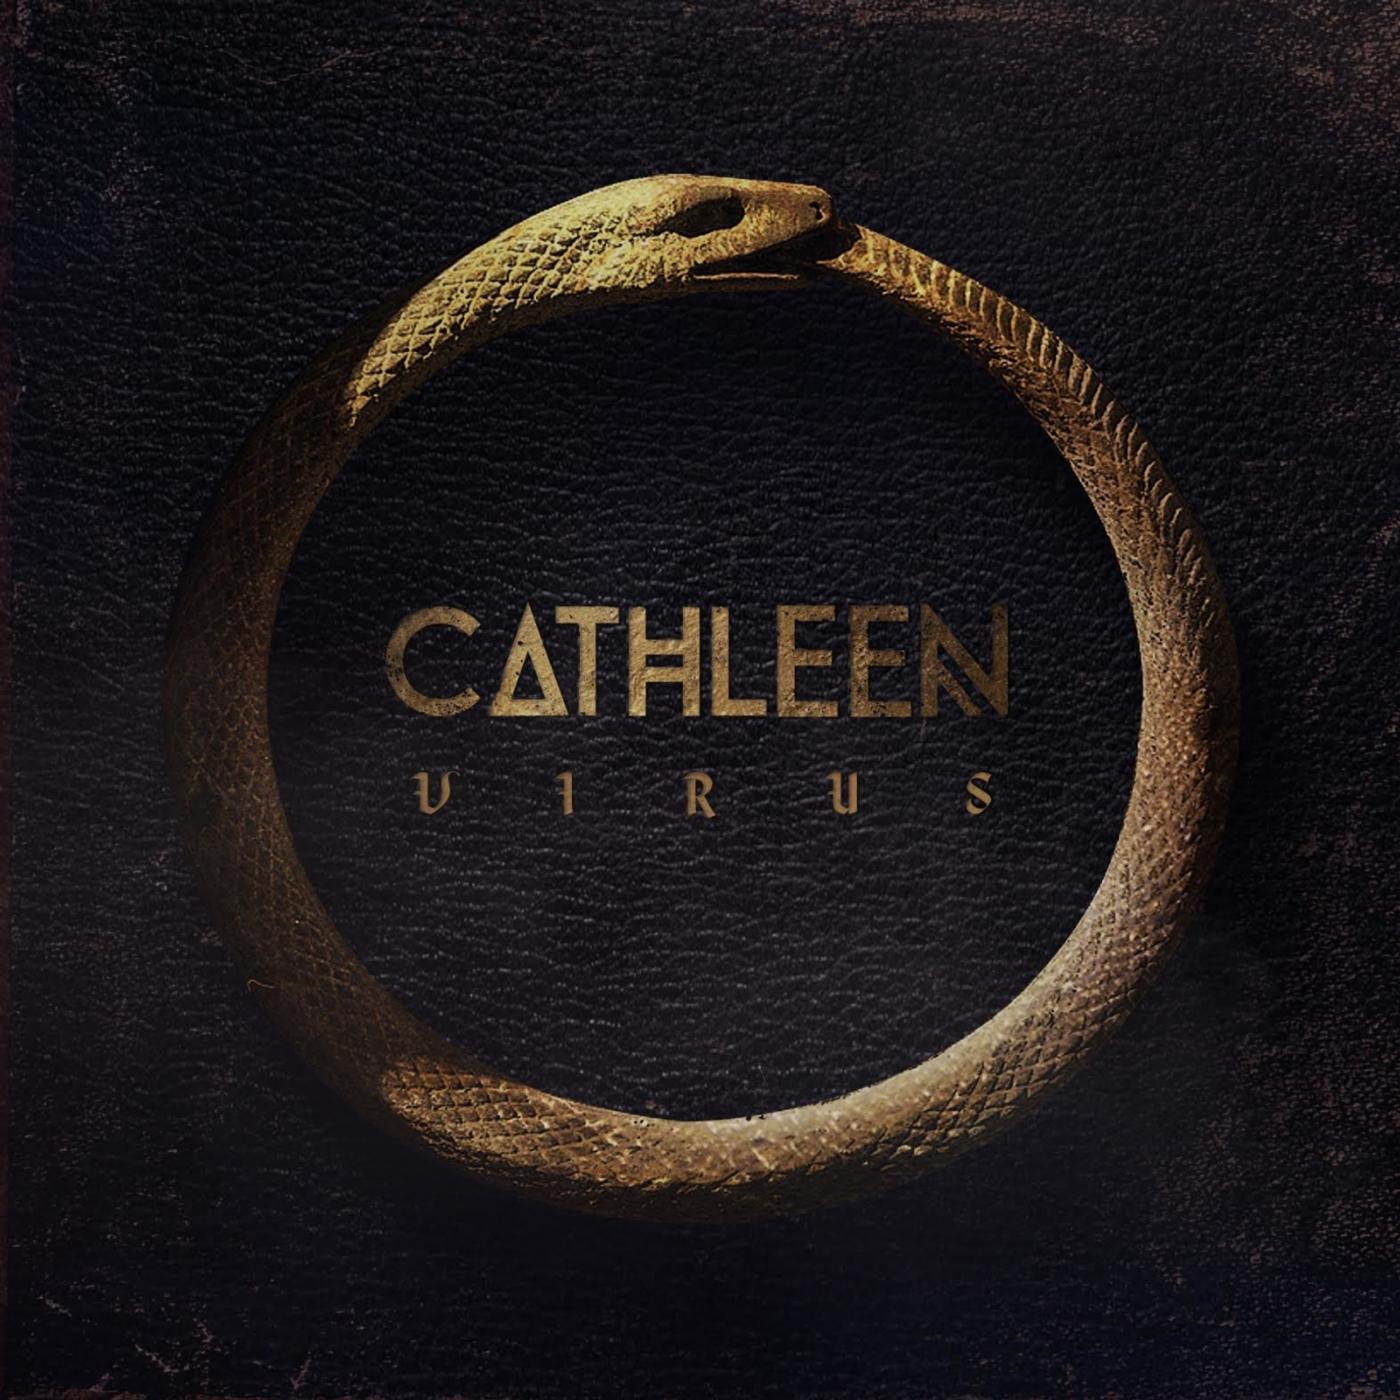 Cathleen - Virus (2016)